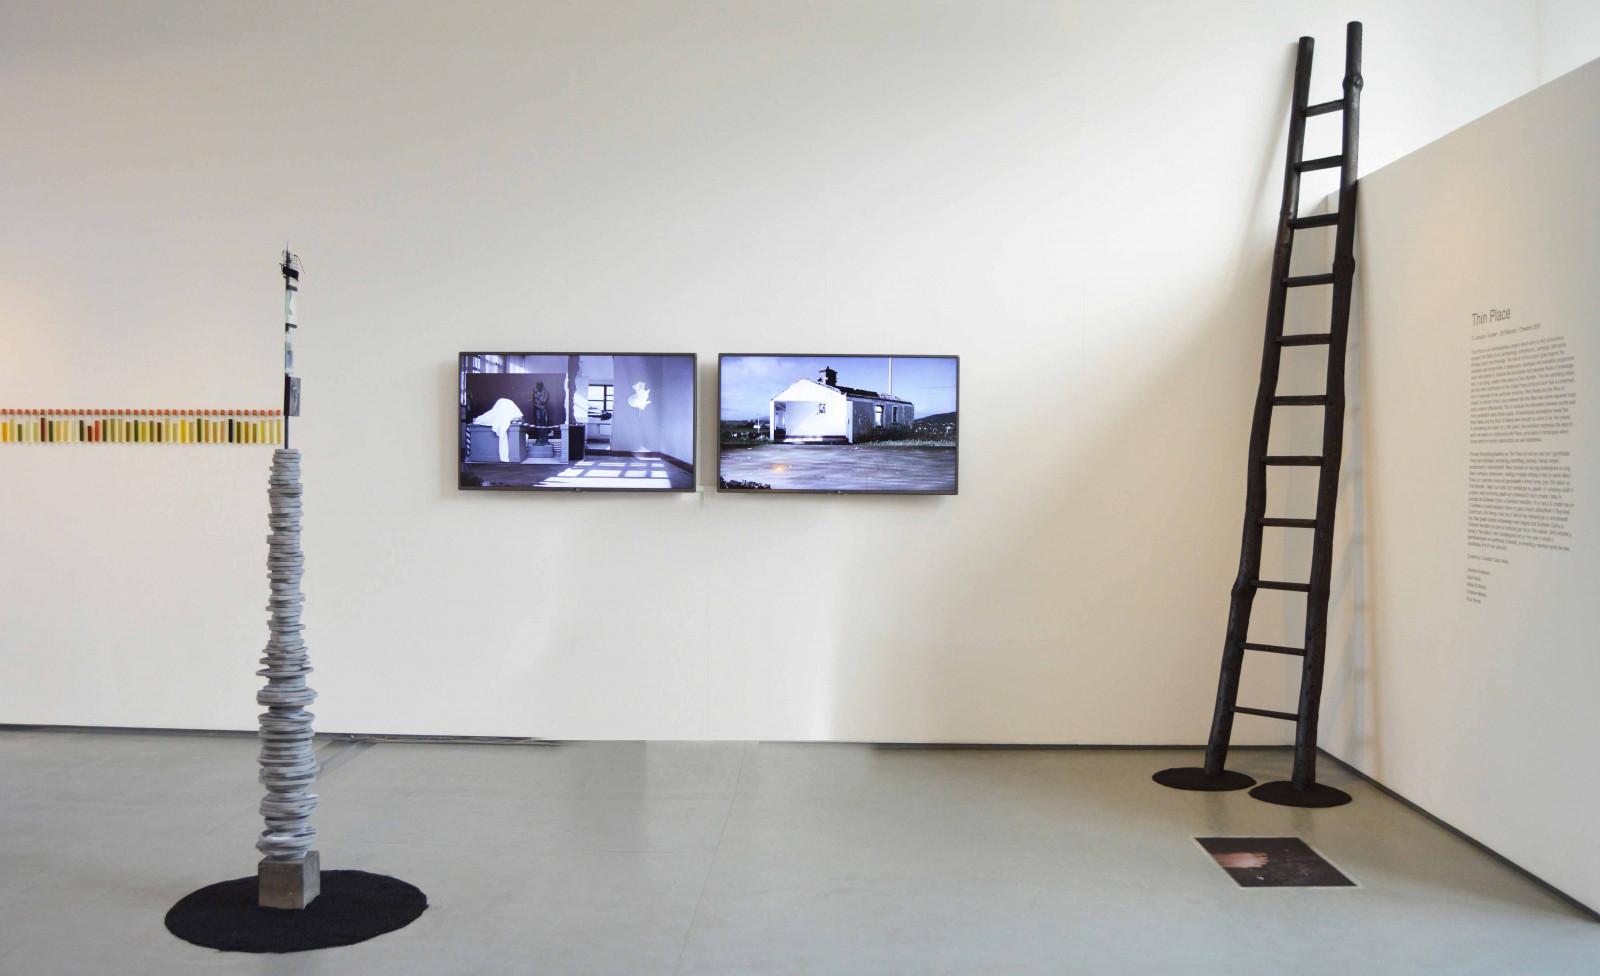 Thin Place, Oriel Myrddin, Carmarthen, Wales, 2015. Curated by Ciara Healy.